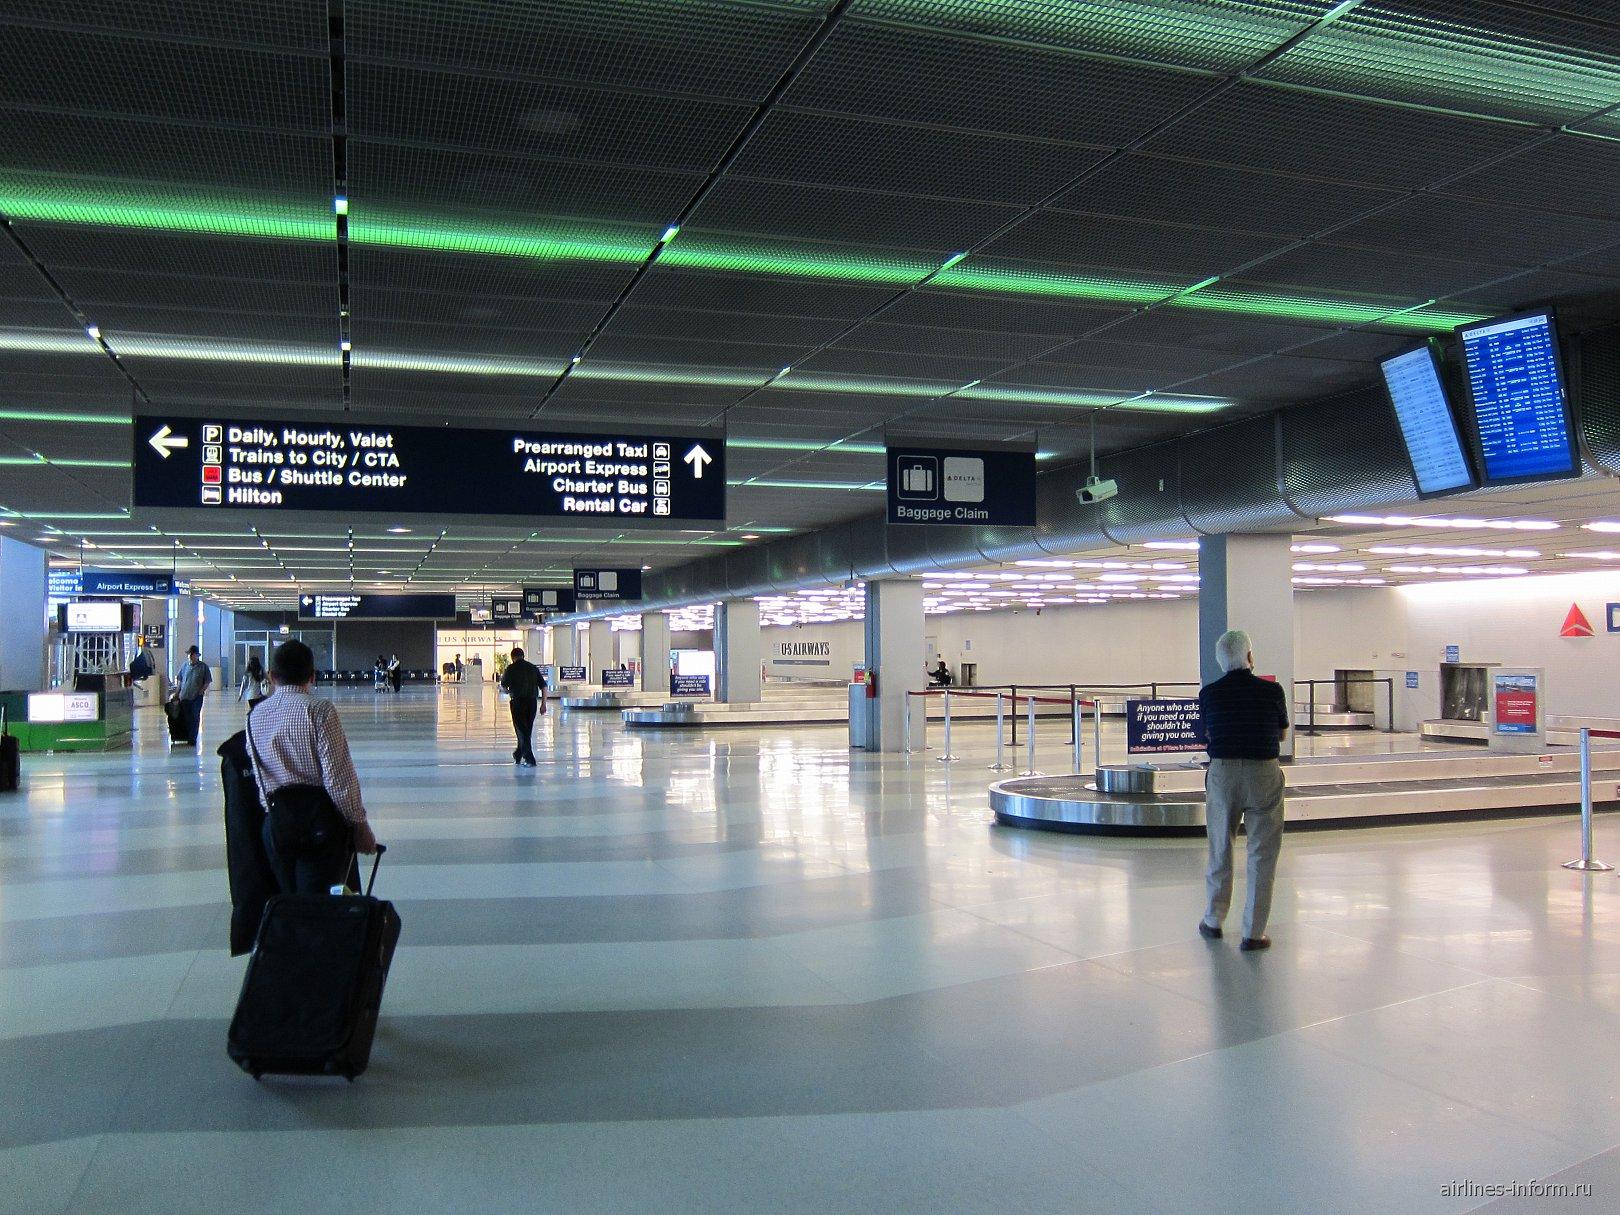 Зал выдачи багажа в терминале 2 аэропорта Чикаго О'Хара